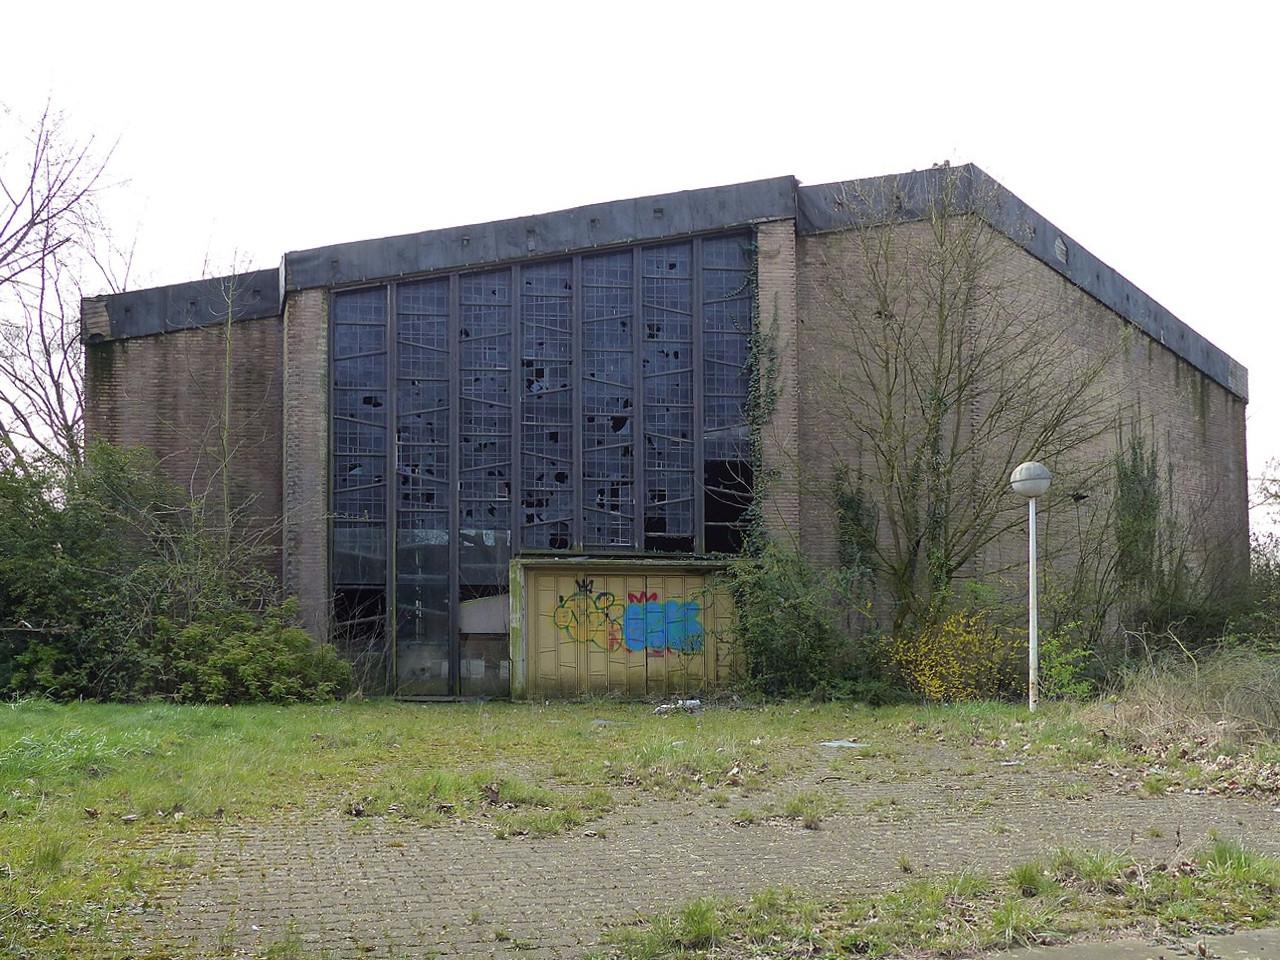 Duisburg-Meiderich, Maria Königin (Bild: Thomas.bottrop, CC BY SA 4.0, 2016)